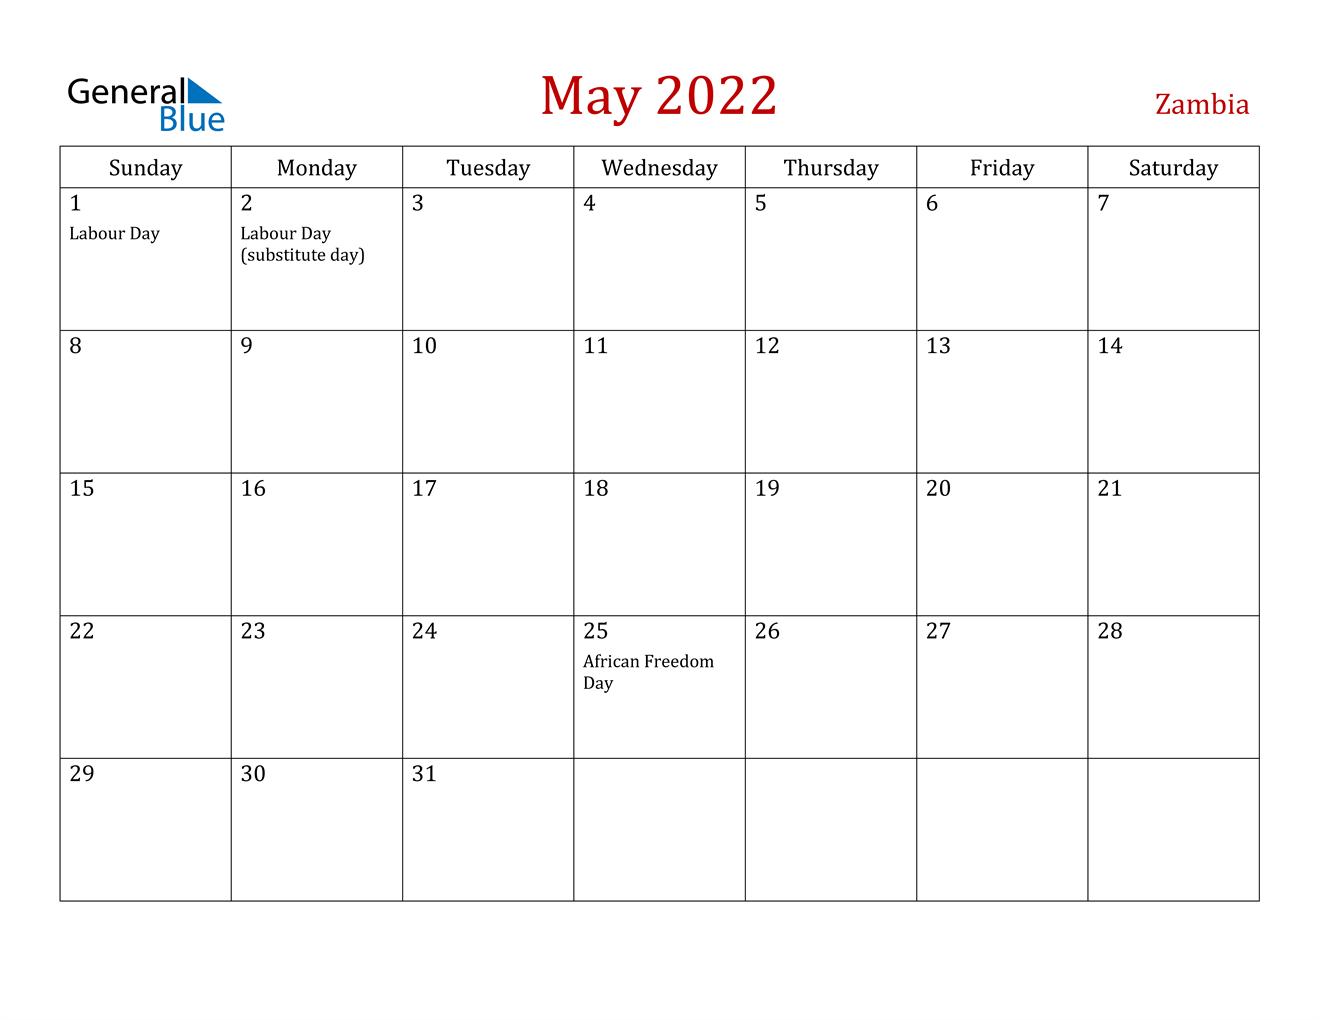 May 2022 Calendar – Zambia Within March April May 2022 Calendar Print